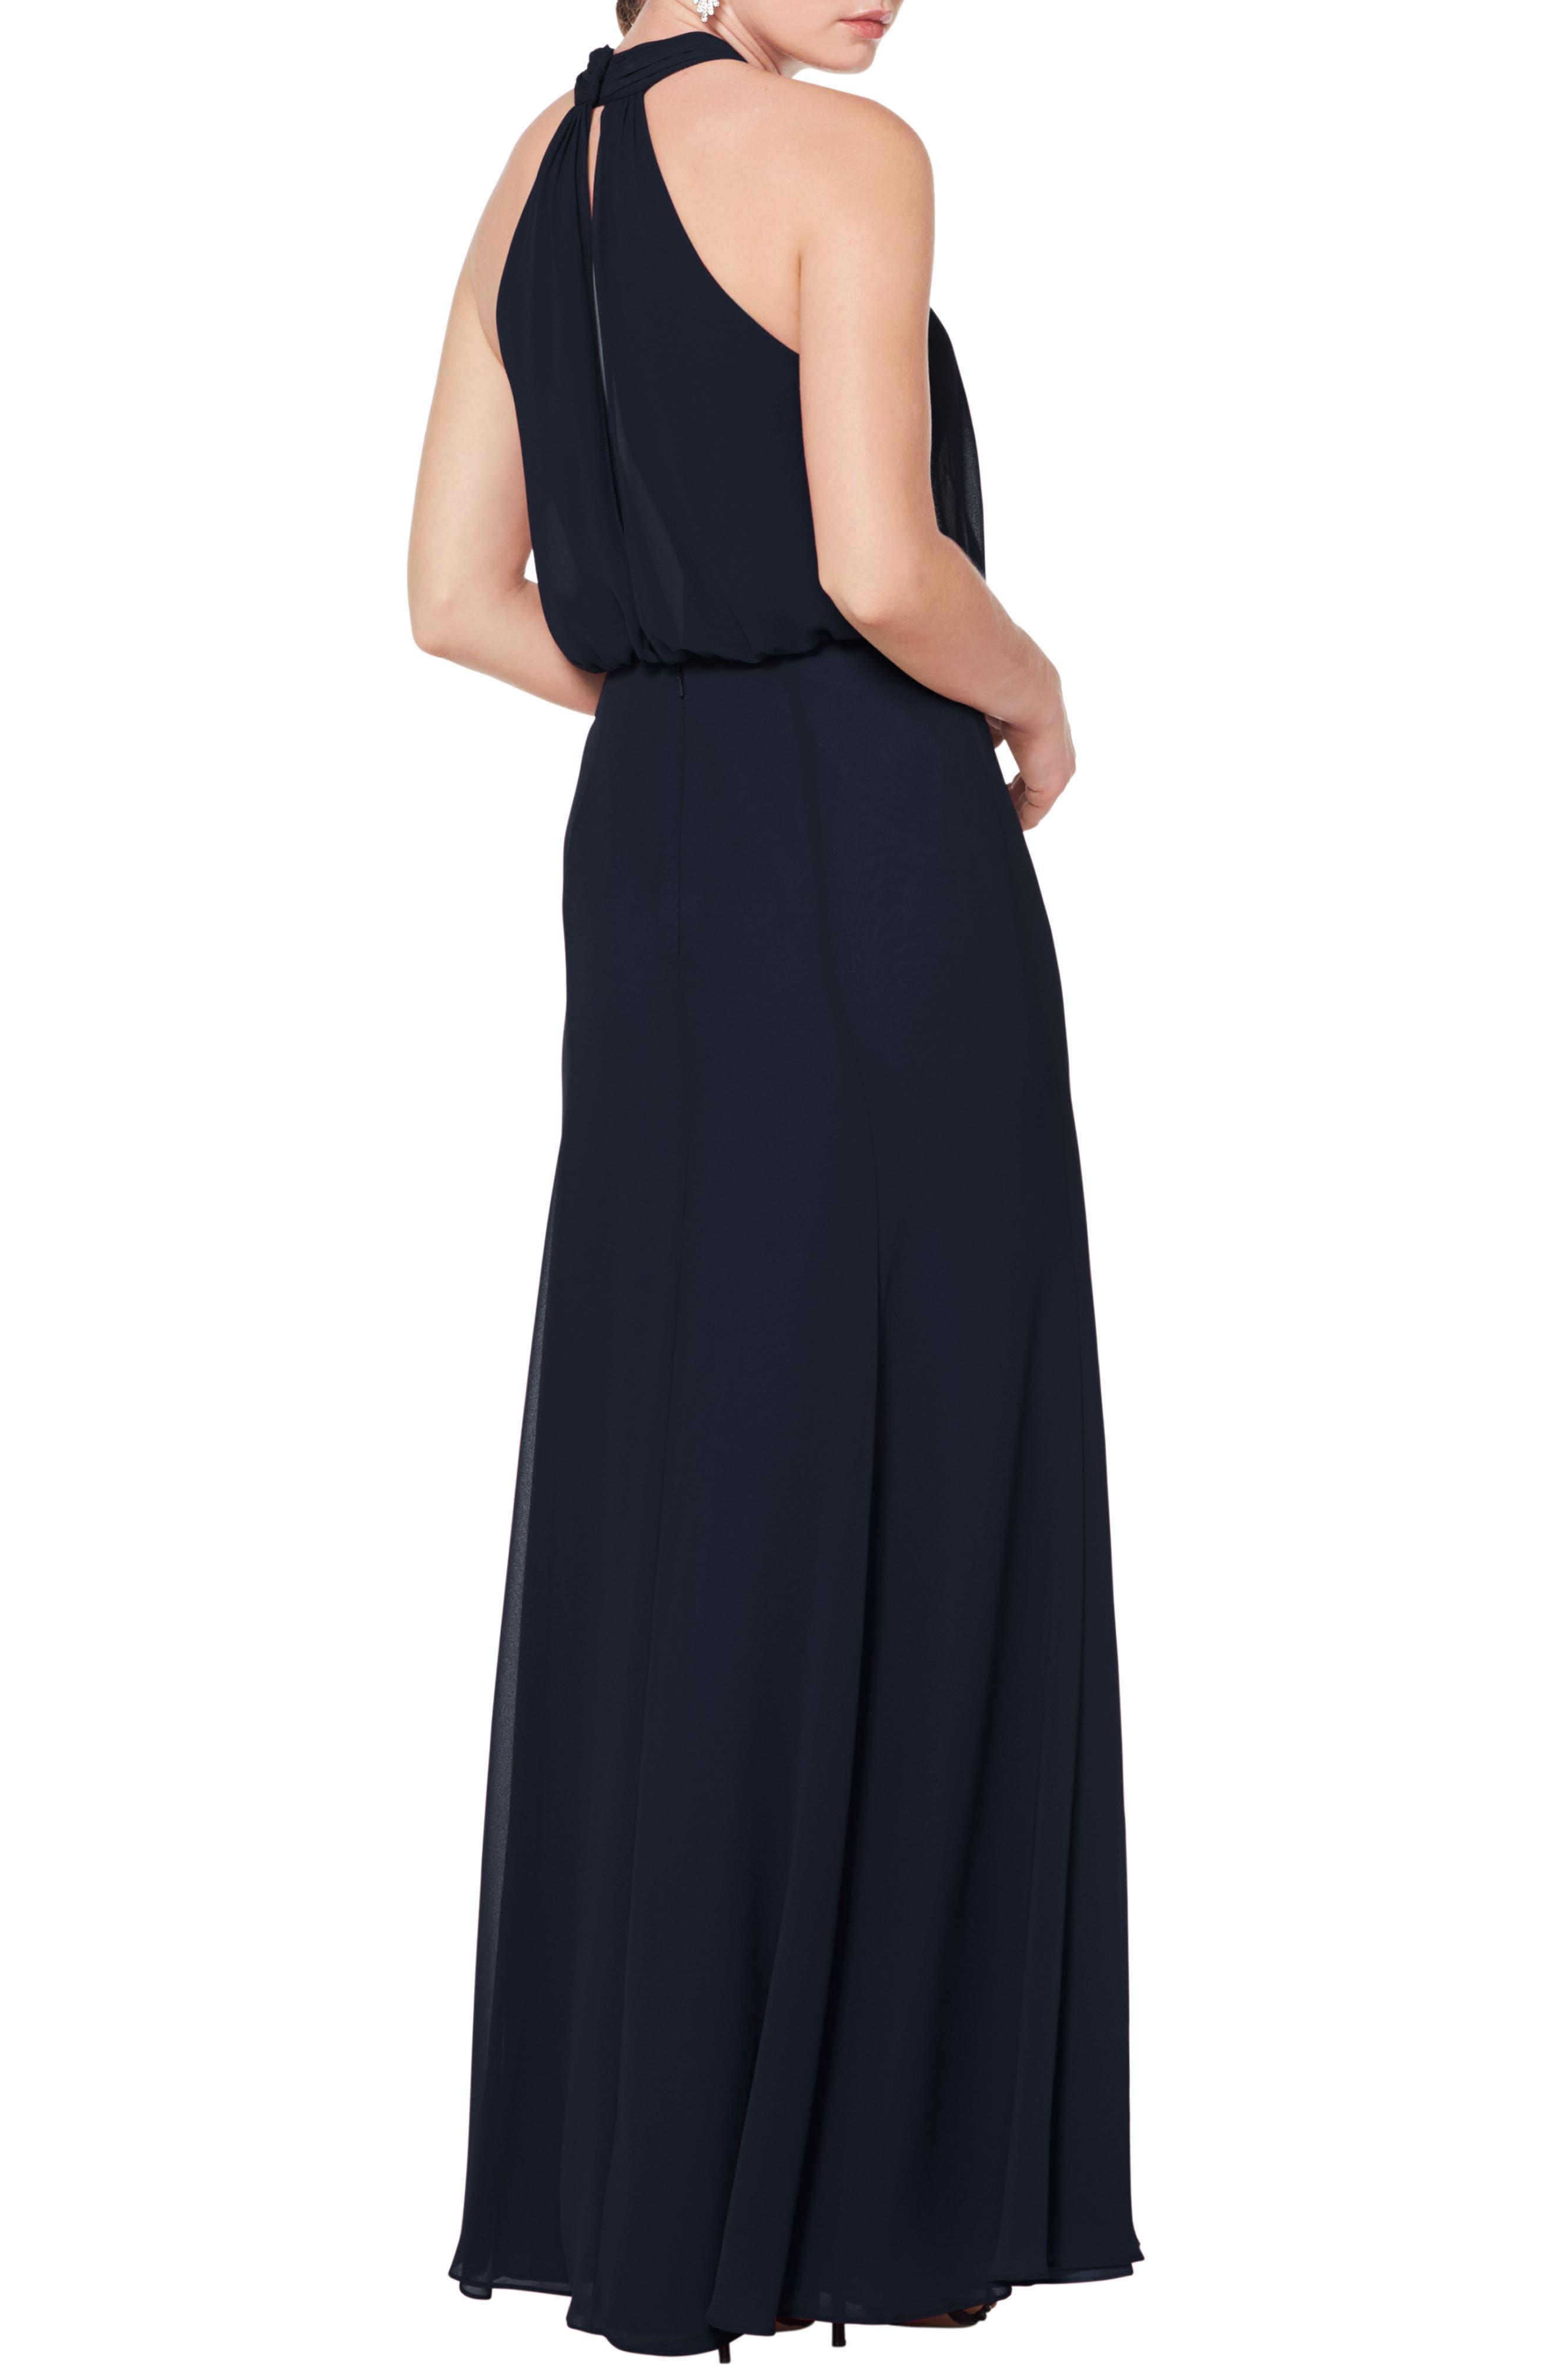 #LEVKOFF, Halter Neck Blouson Bodice Evening Dress, Alternate thumbnail 2, color, NAVY